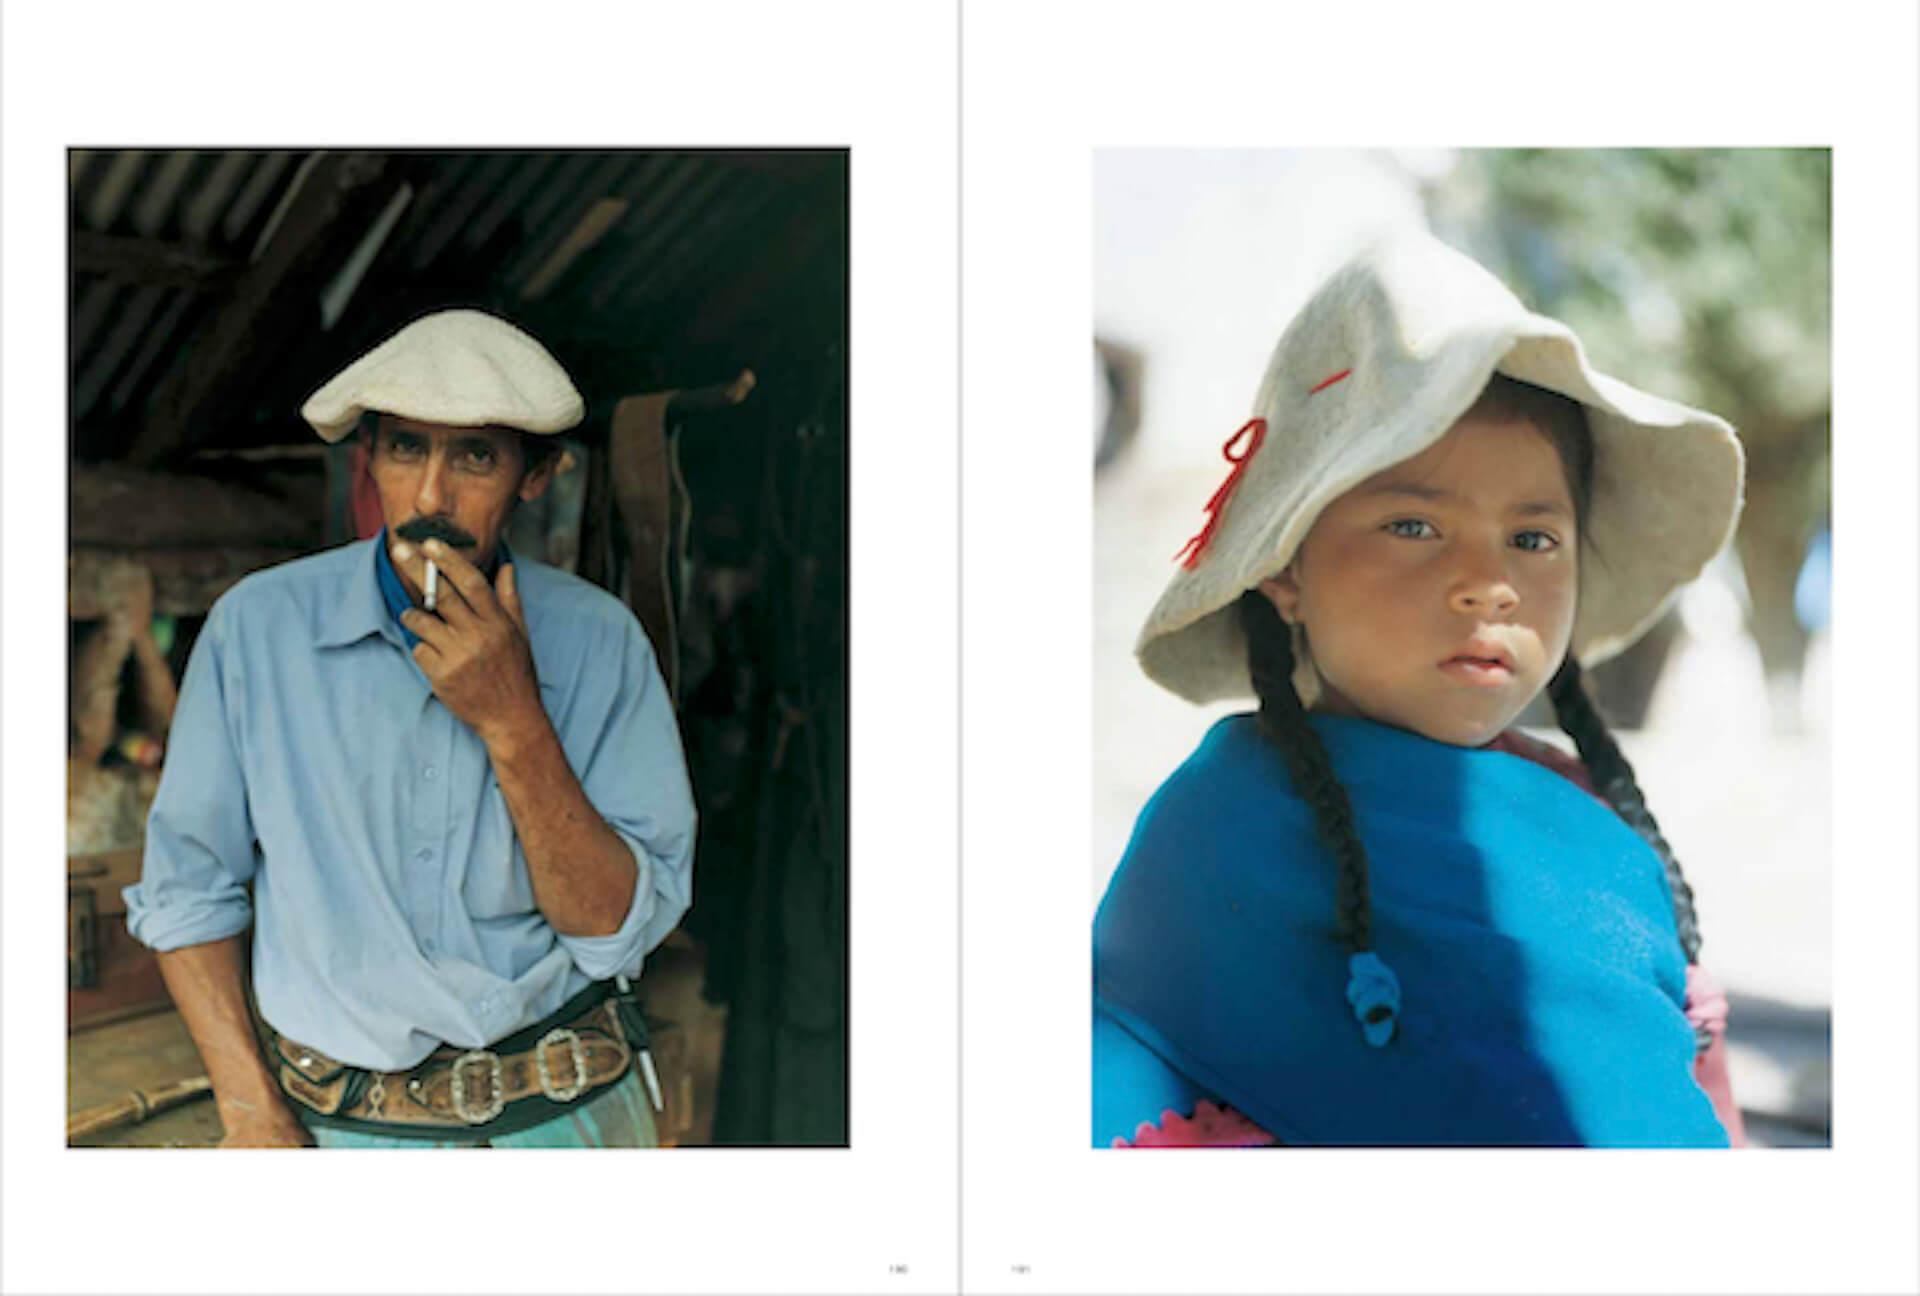 『TRANSIT』の10年超の歩みが2冊の写真集に!企画展<光の記憶- Through our habitat>も開催 art191029_transit_7